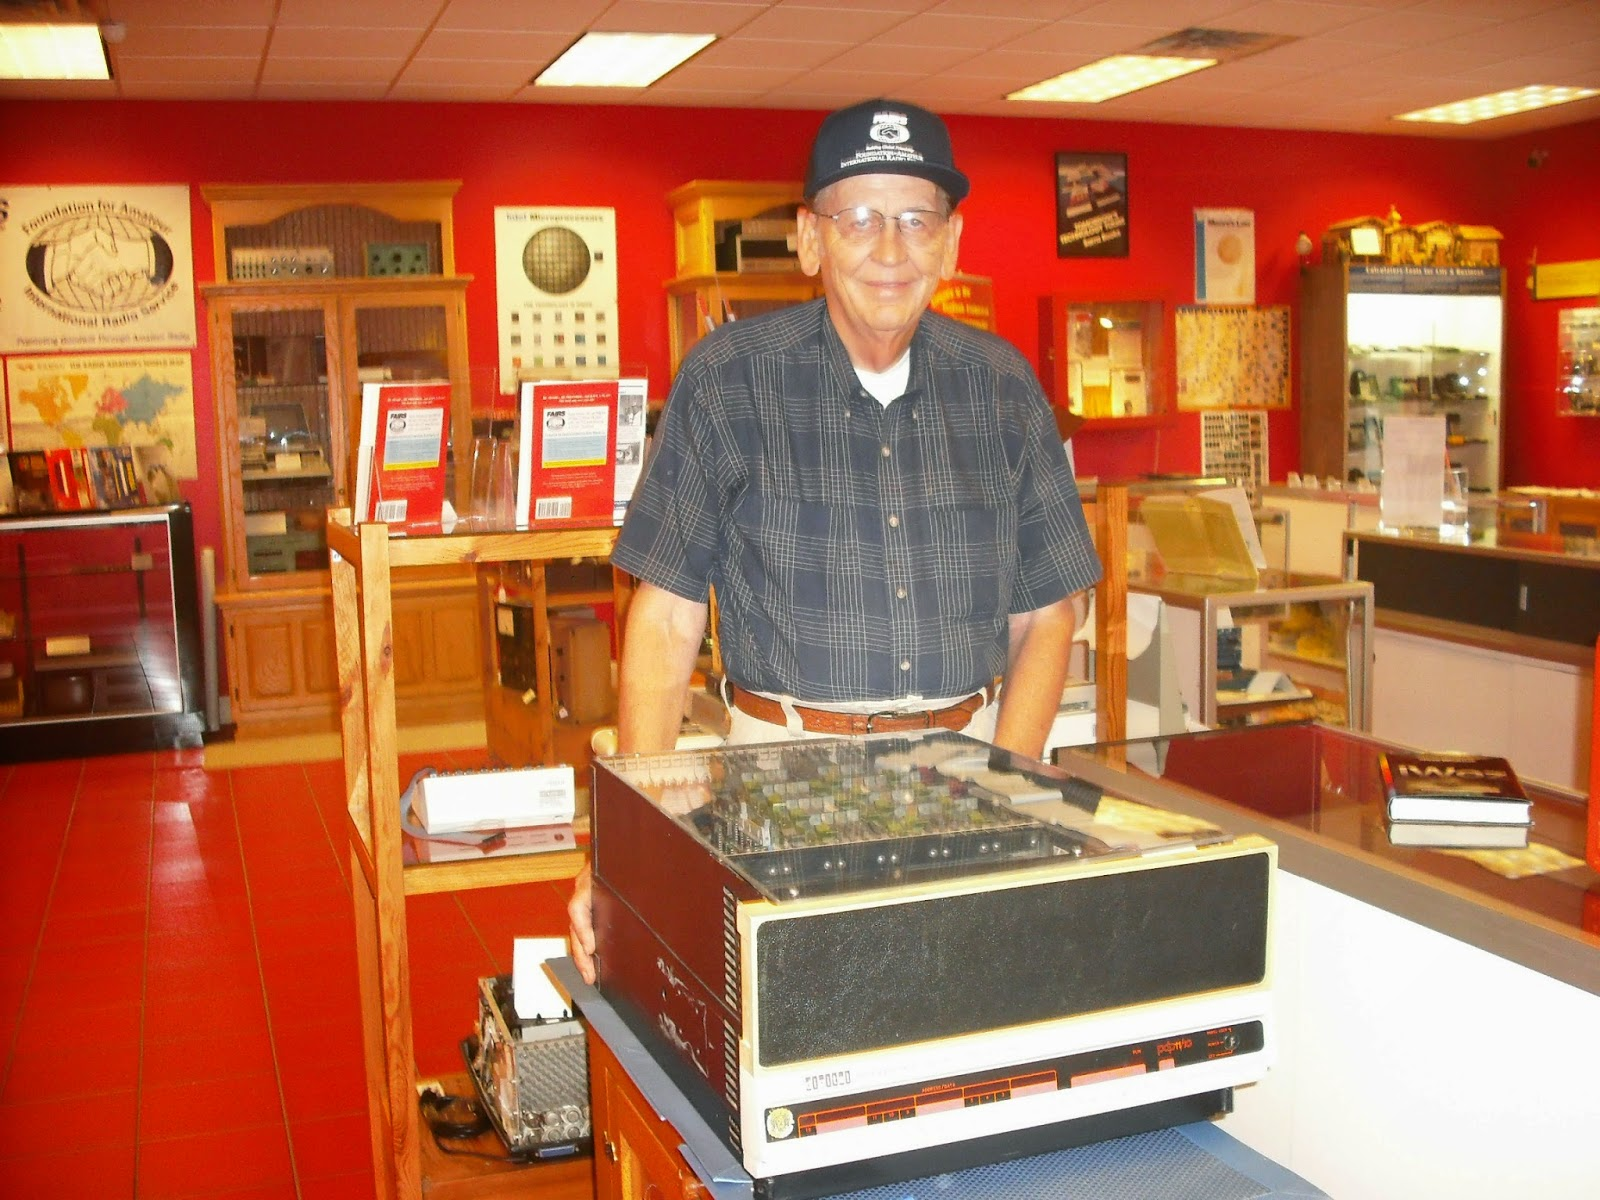 David larsen, Bugbook,bugbooks,bugbook.com,kk4ww